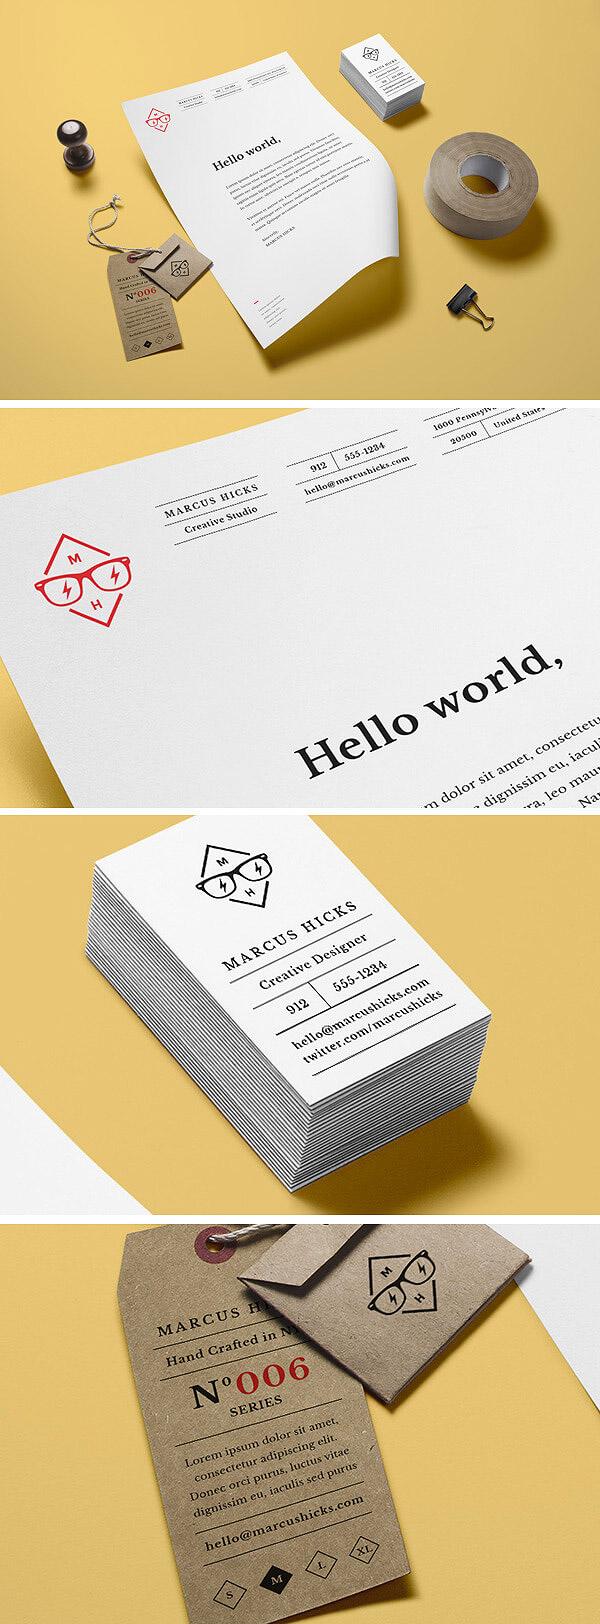 Branding / Identity MockUp Vol.14